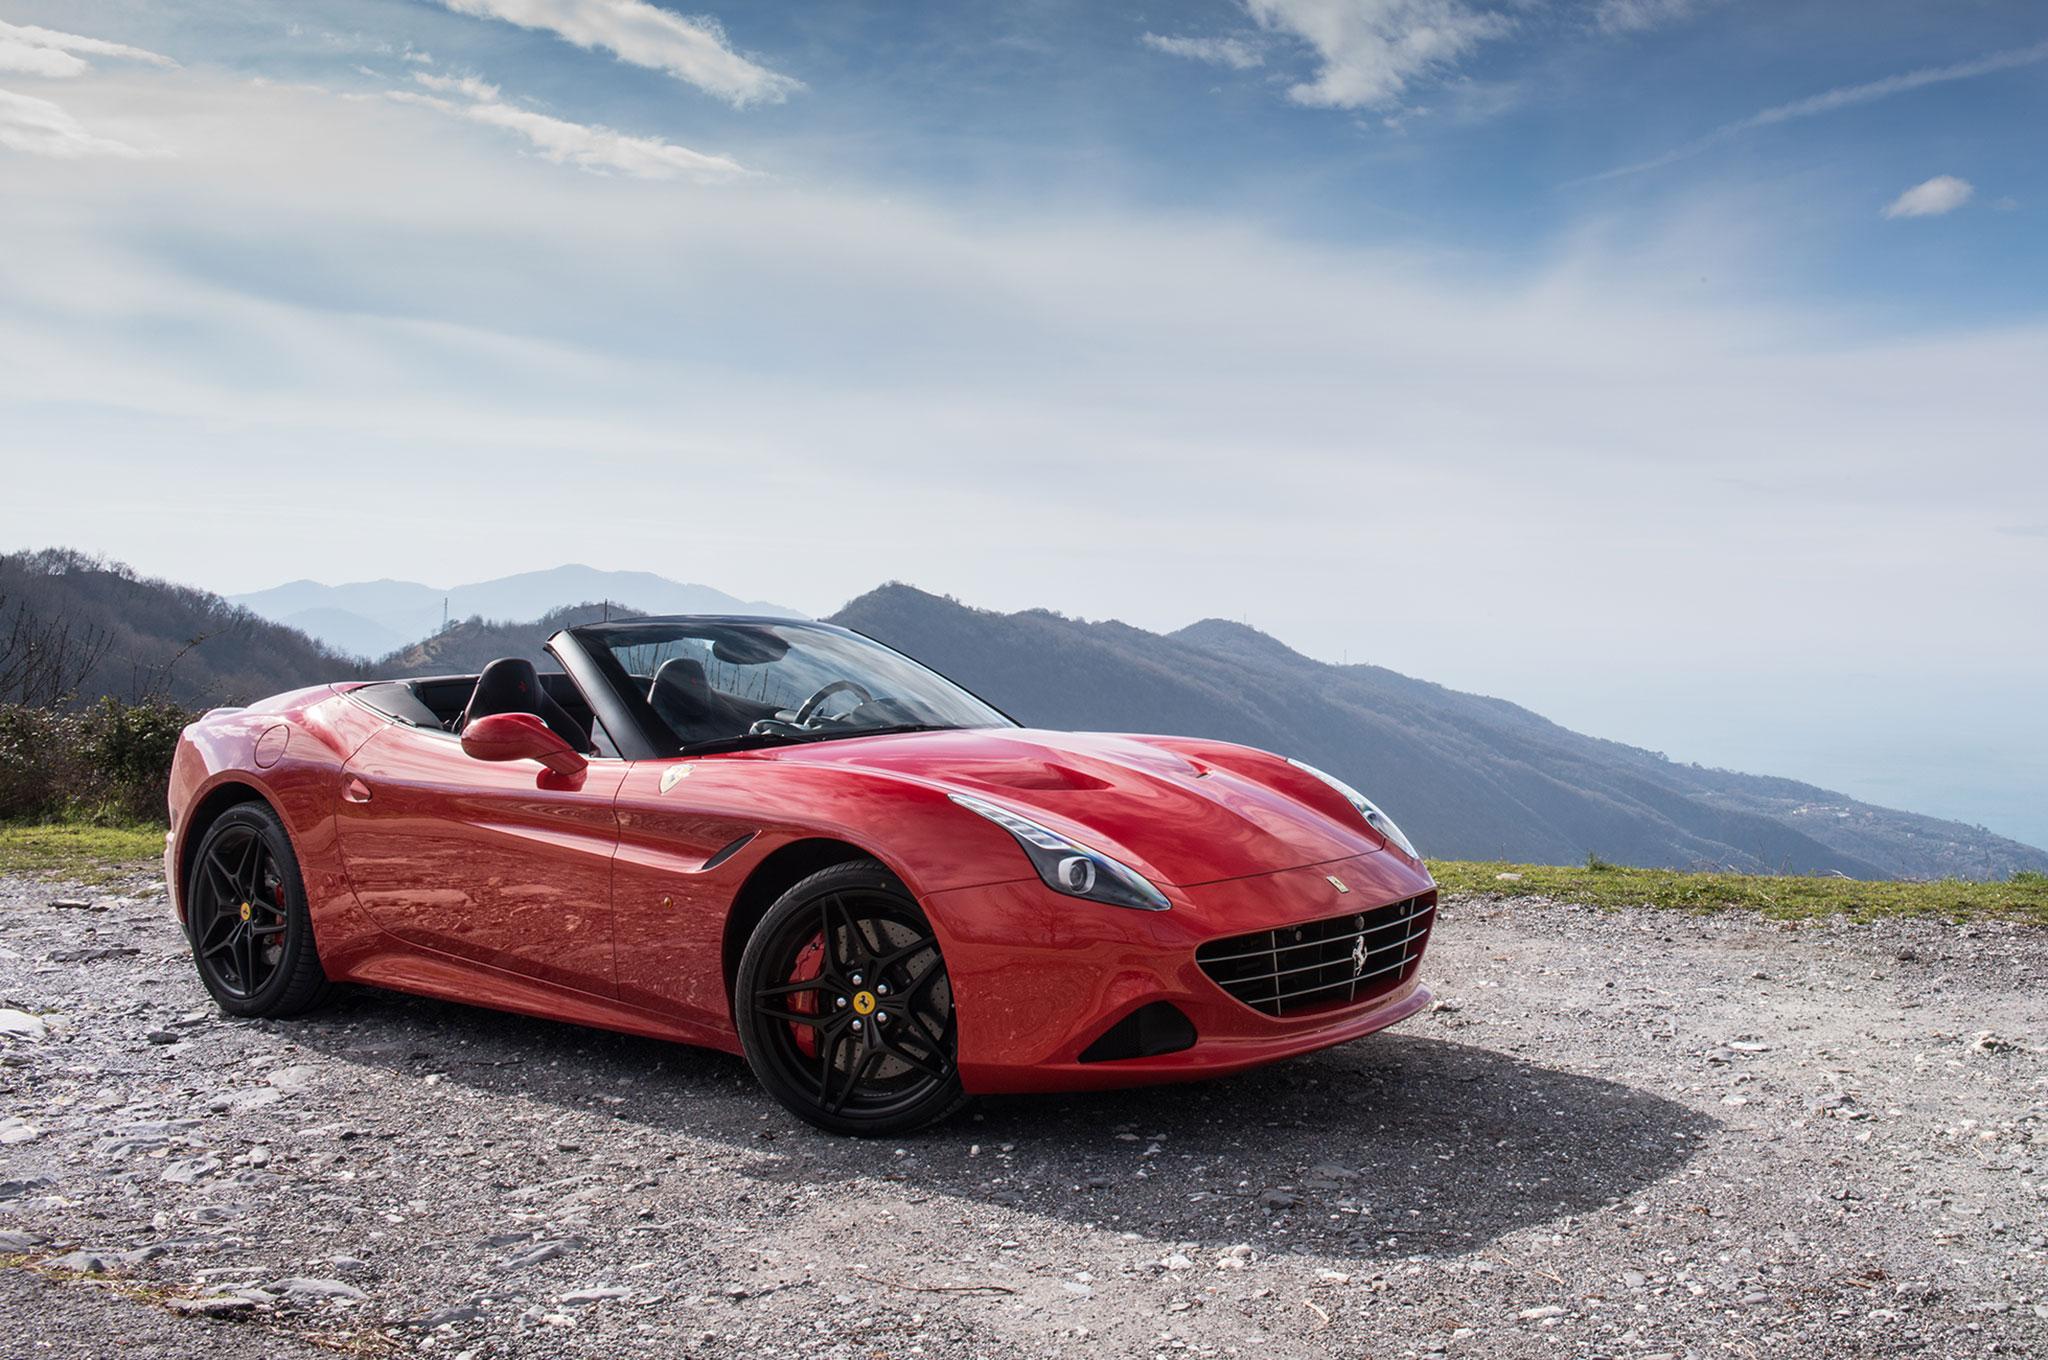 Ferrari California T Wallpapers Vehicles Hq Ferrari California T Pictures 4k Wallpapers 2019